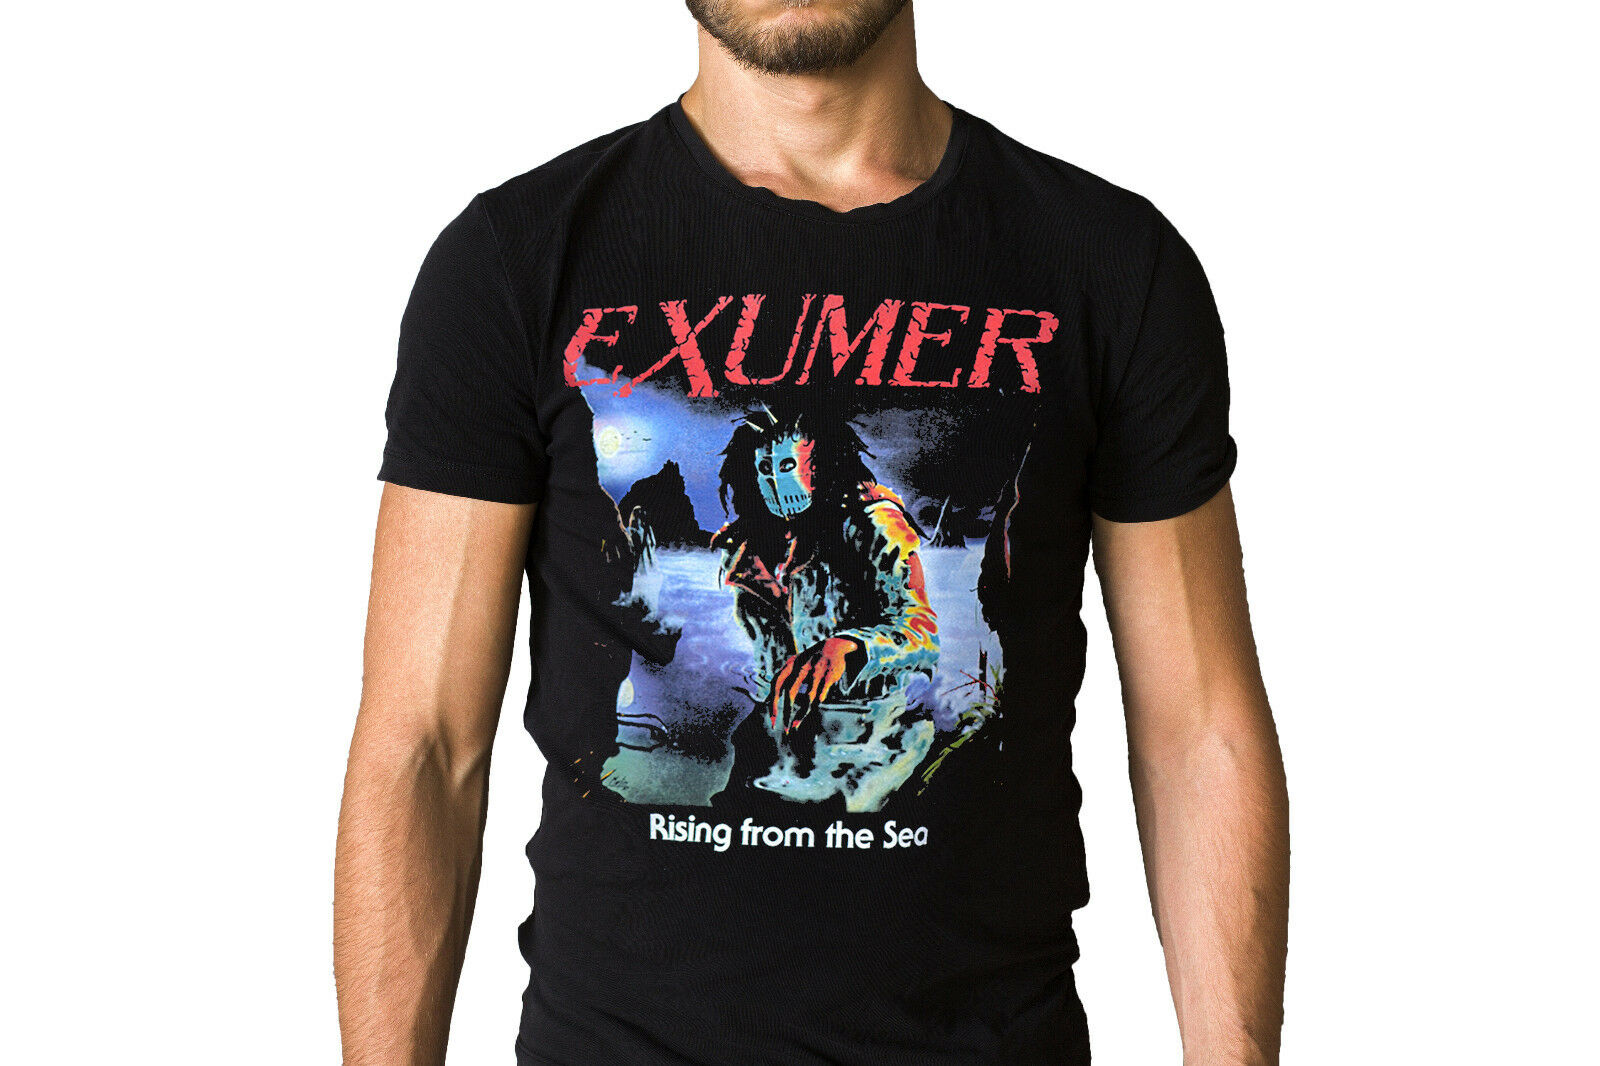 Exumer Rising From The Sea 1987 Album T-Shirt